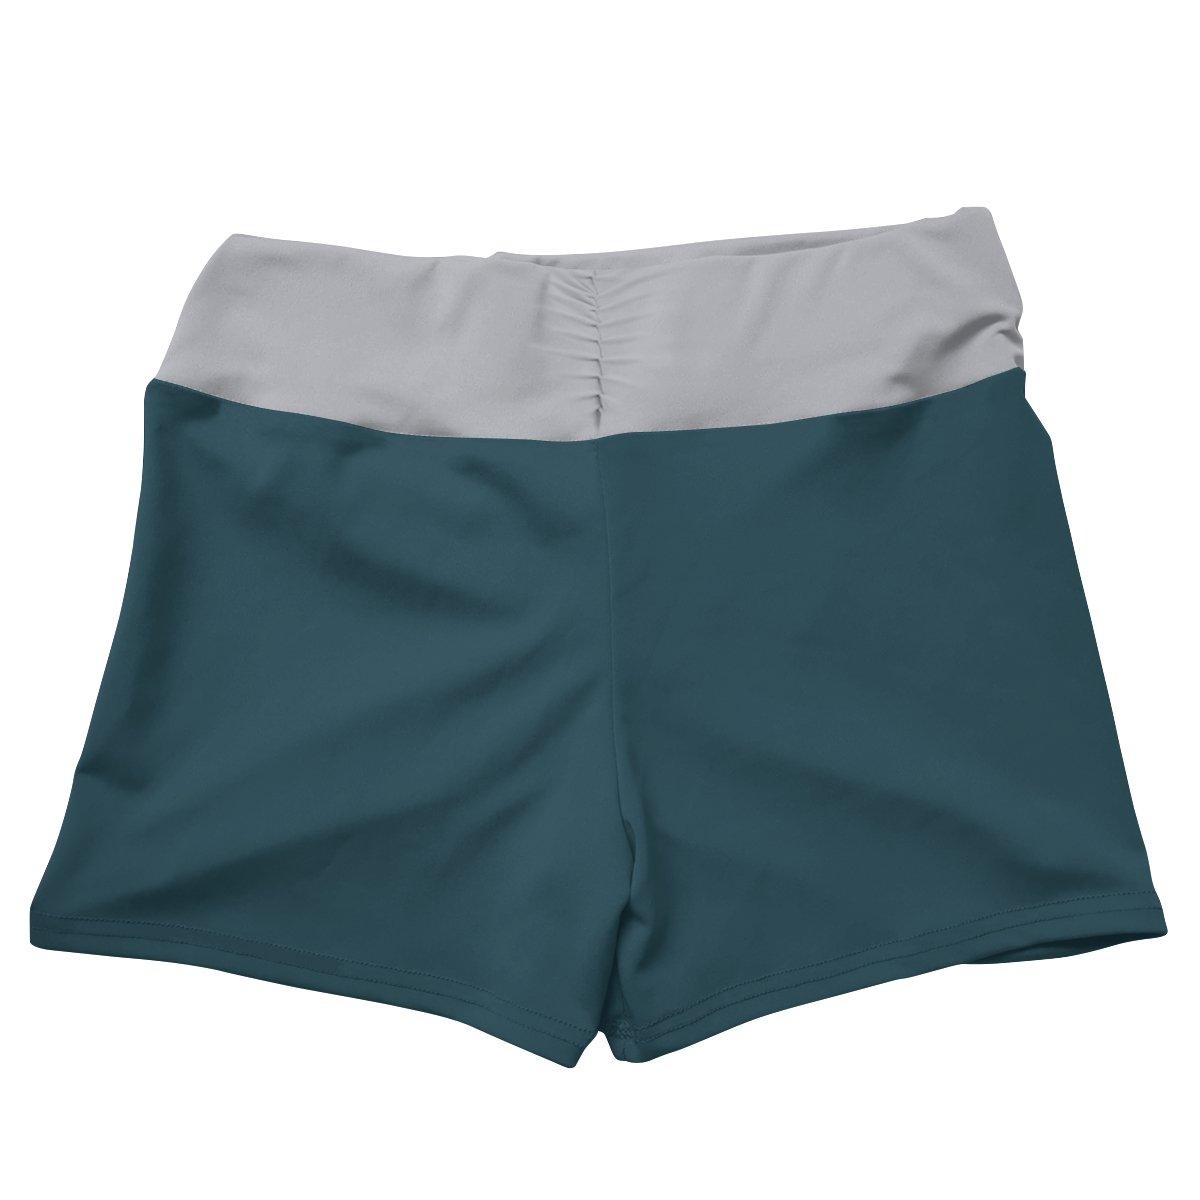 ua high uniform active wear set 388569 - Anime Swimsuits